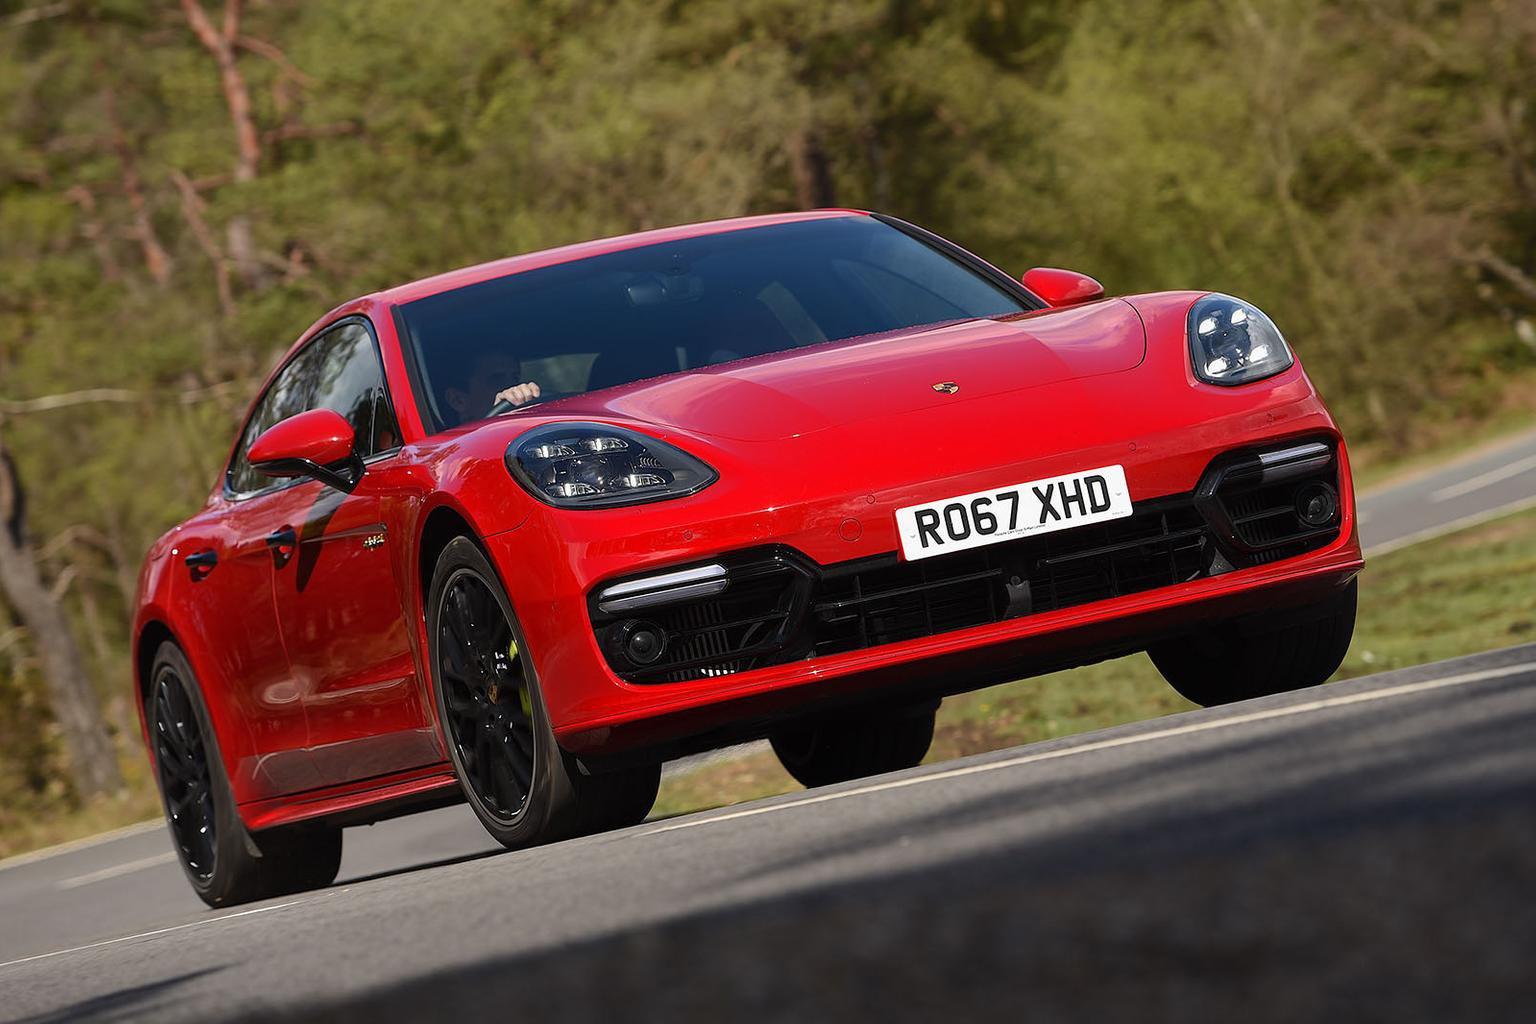 2018 Porsche Panamera Turbo S E Hybrid Review Price Specs And Release Date